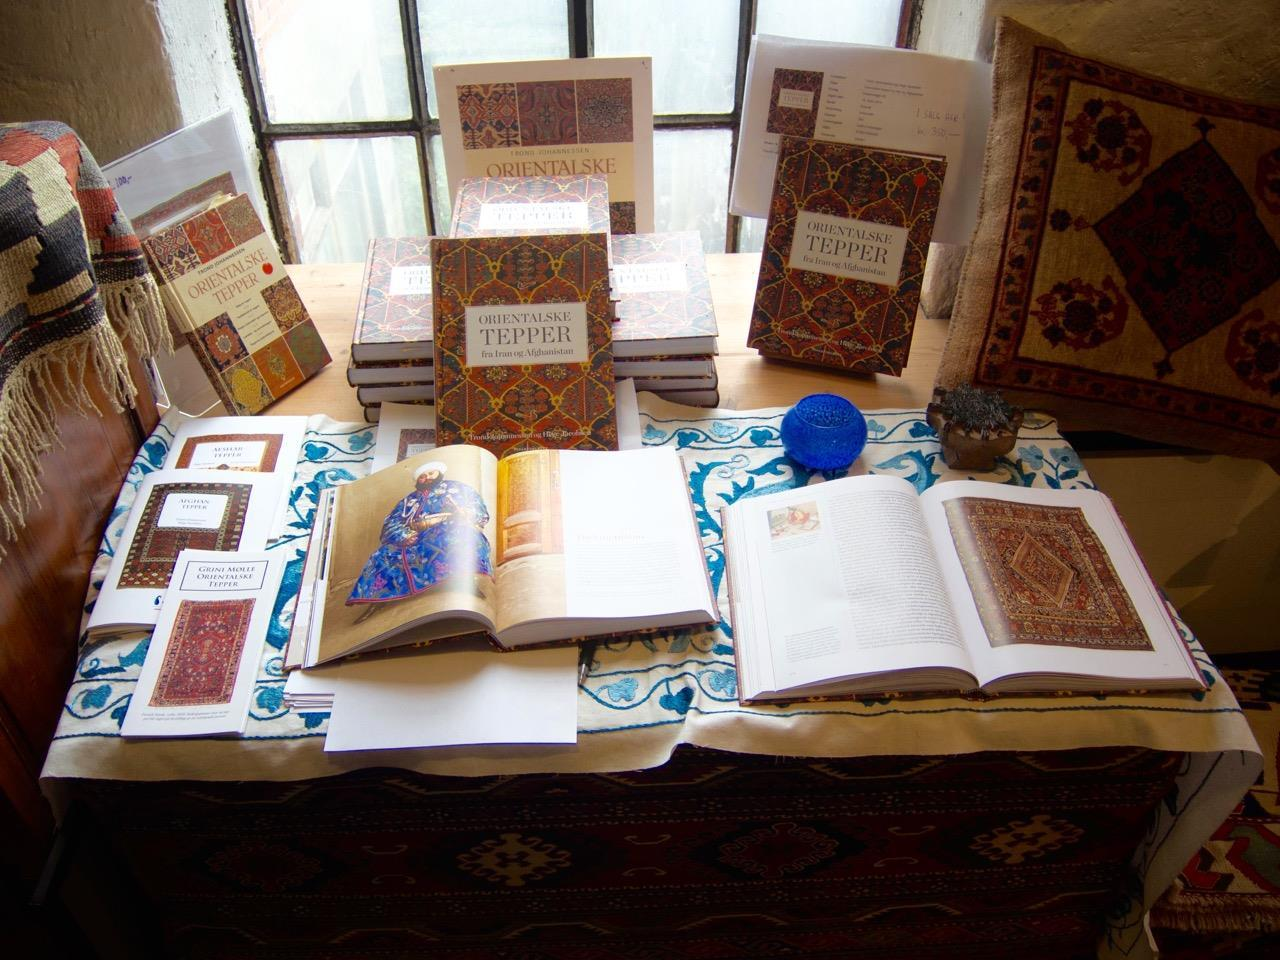 Vår bok 'Orientalske tepper fra Iran og Afghanistan'